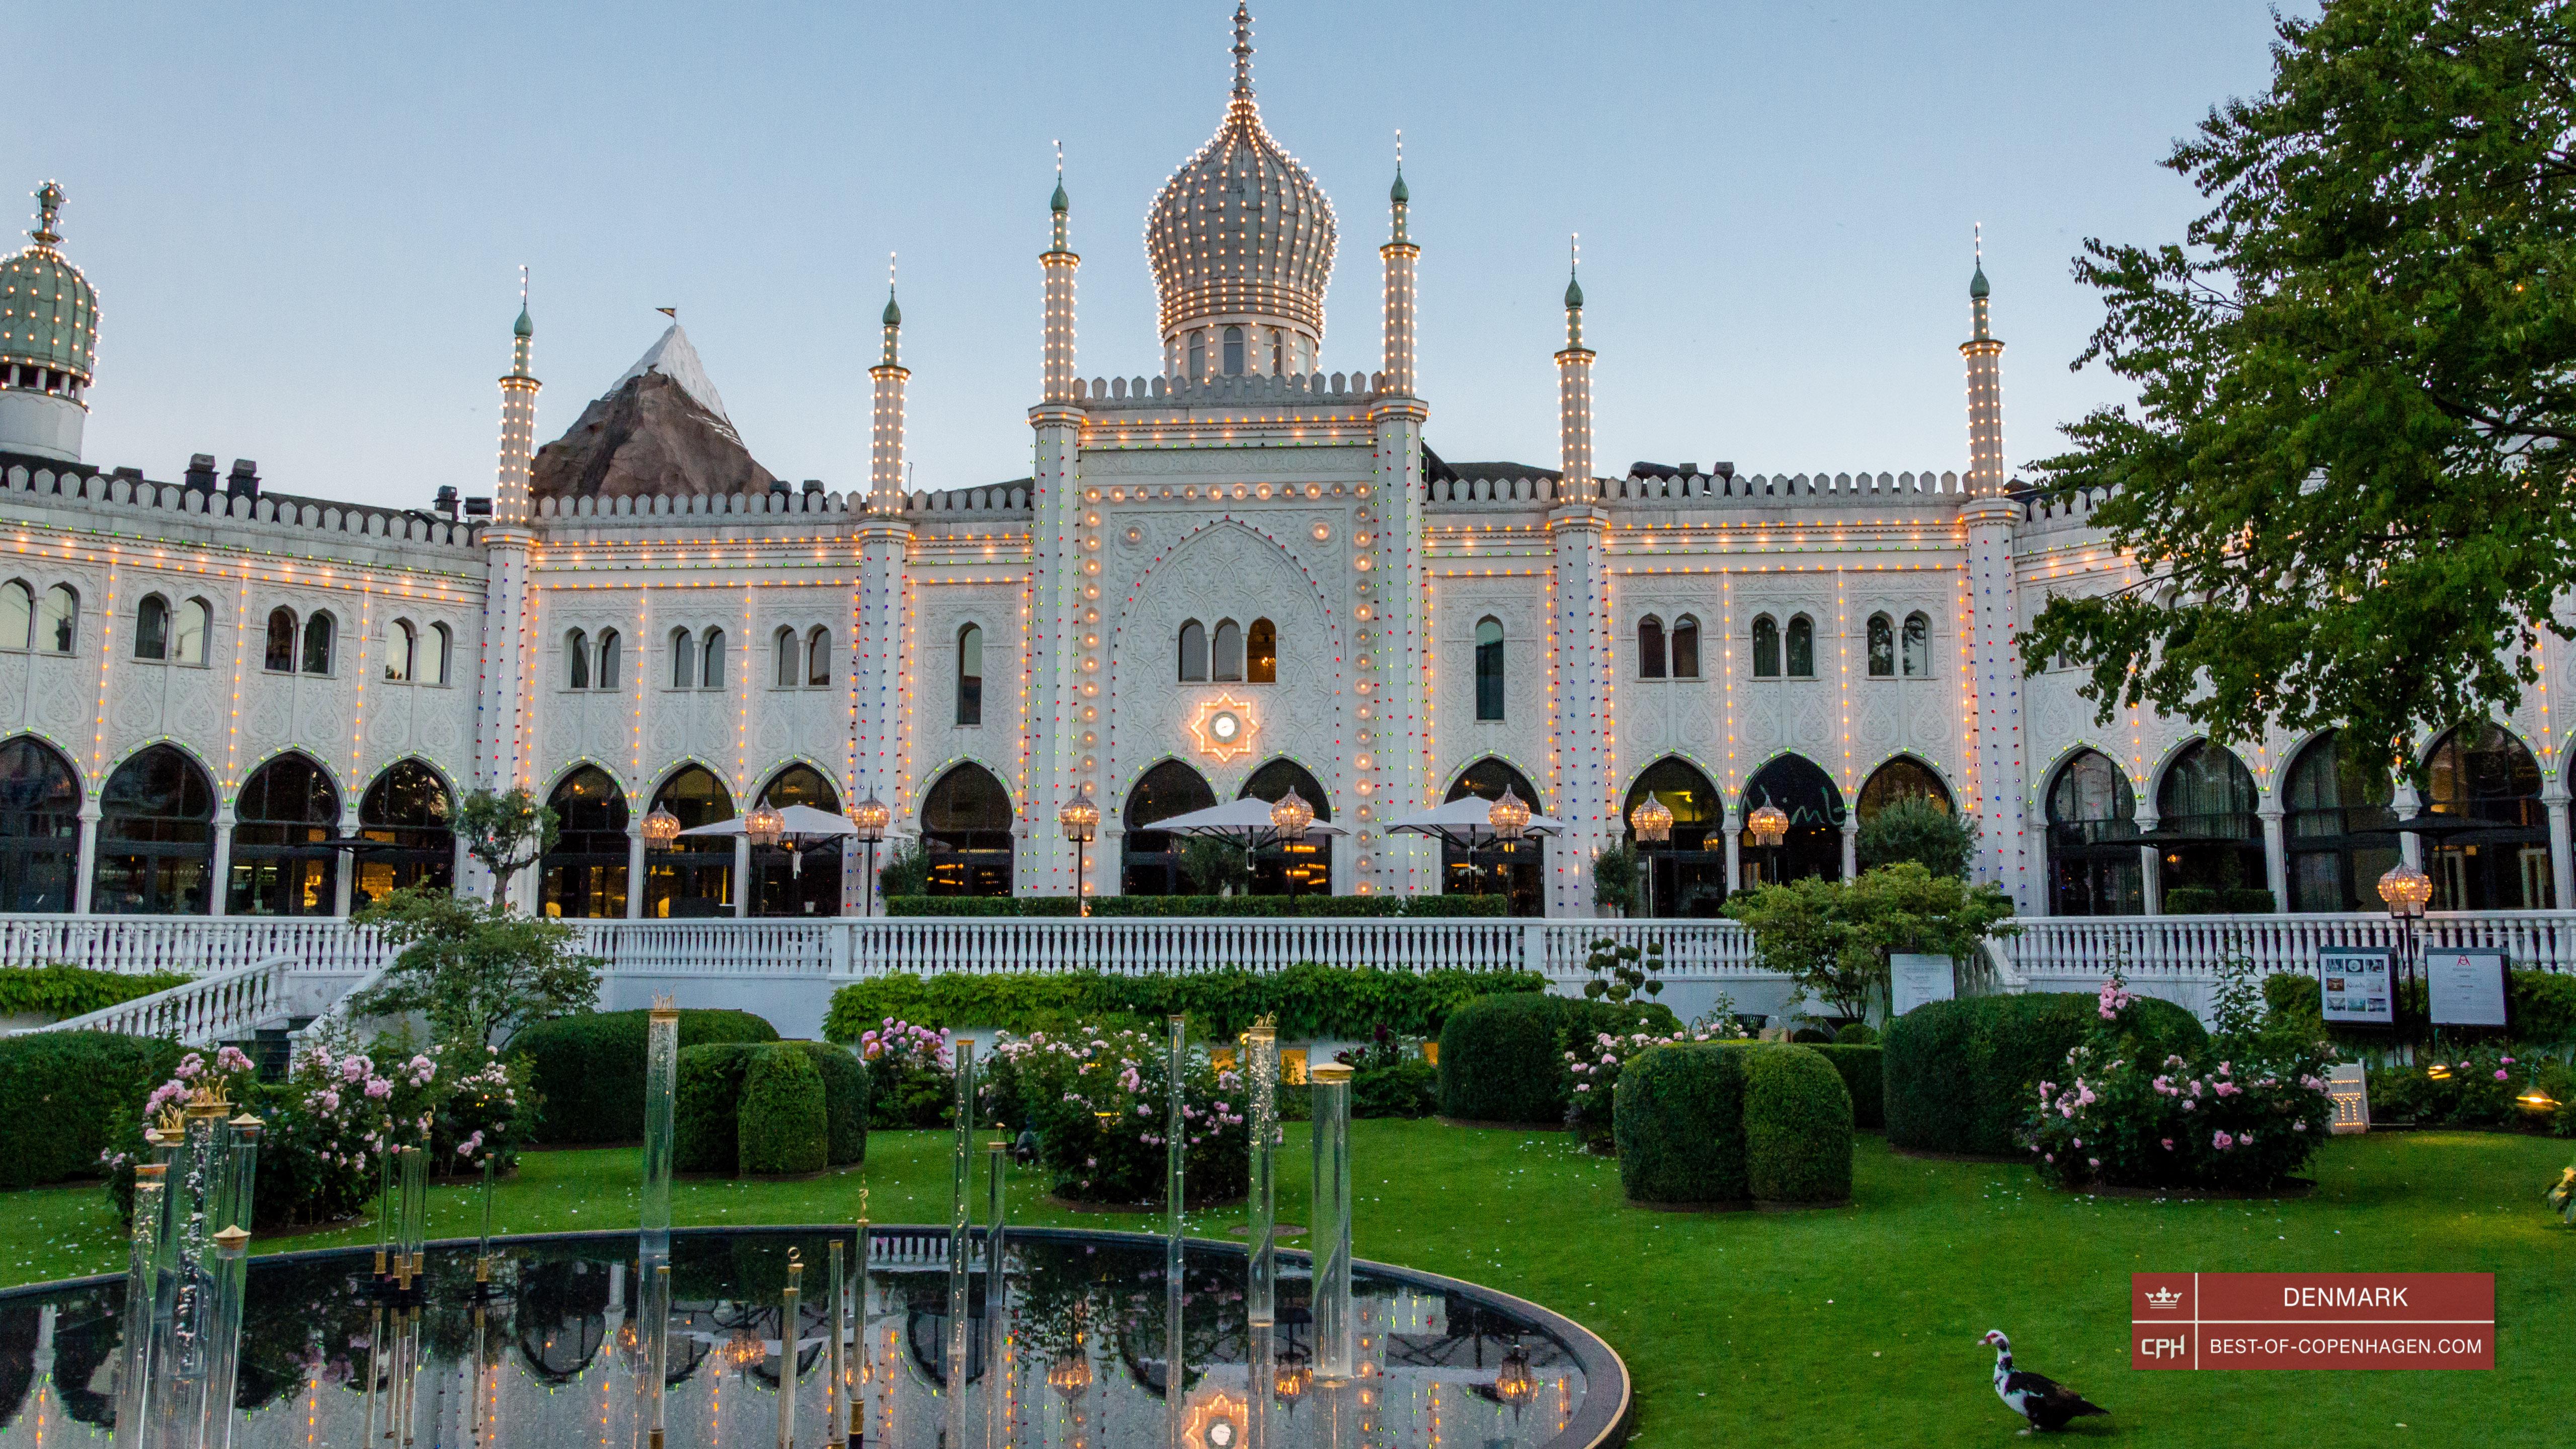 Hotels Near Tivoli Gardens Copenhagen Denmark